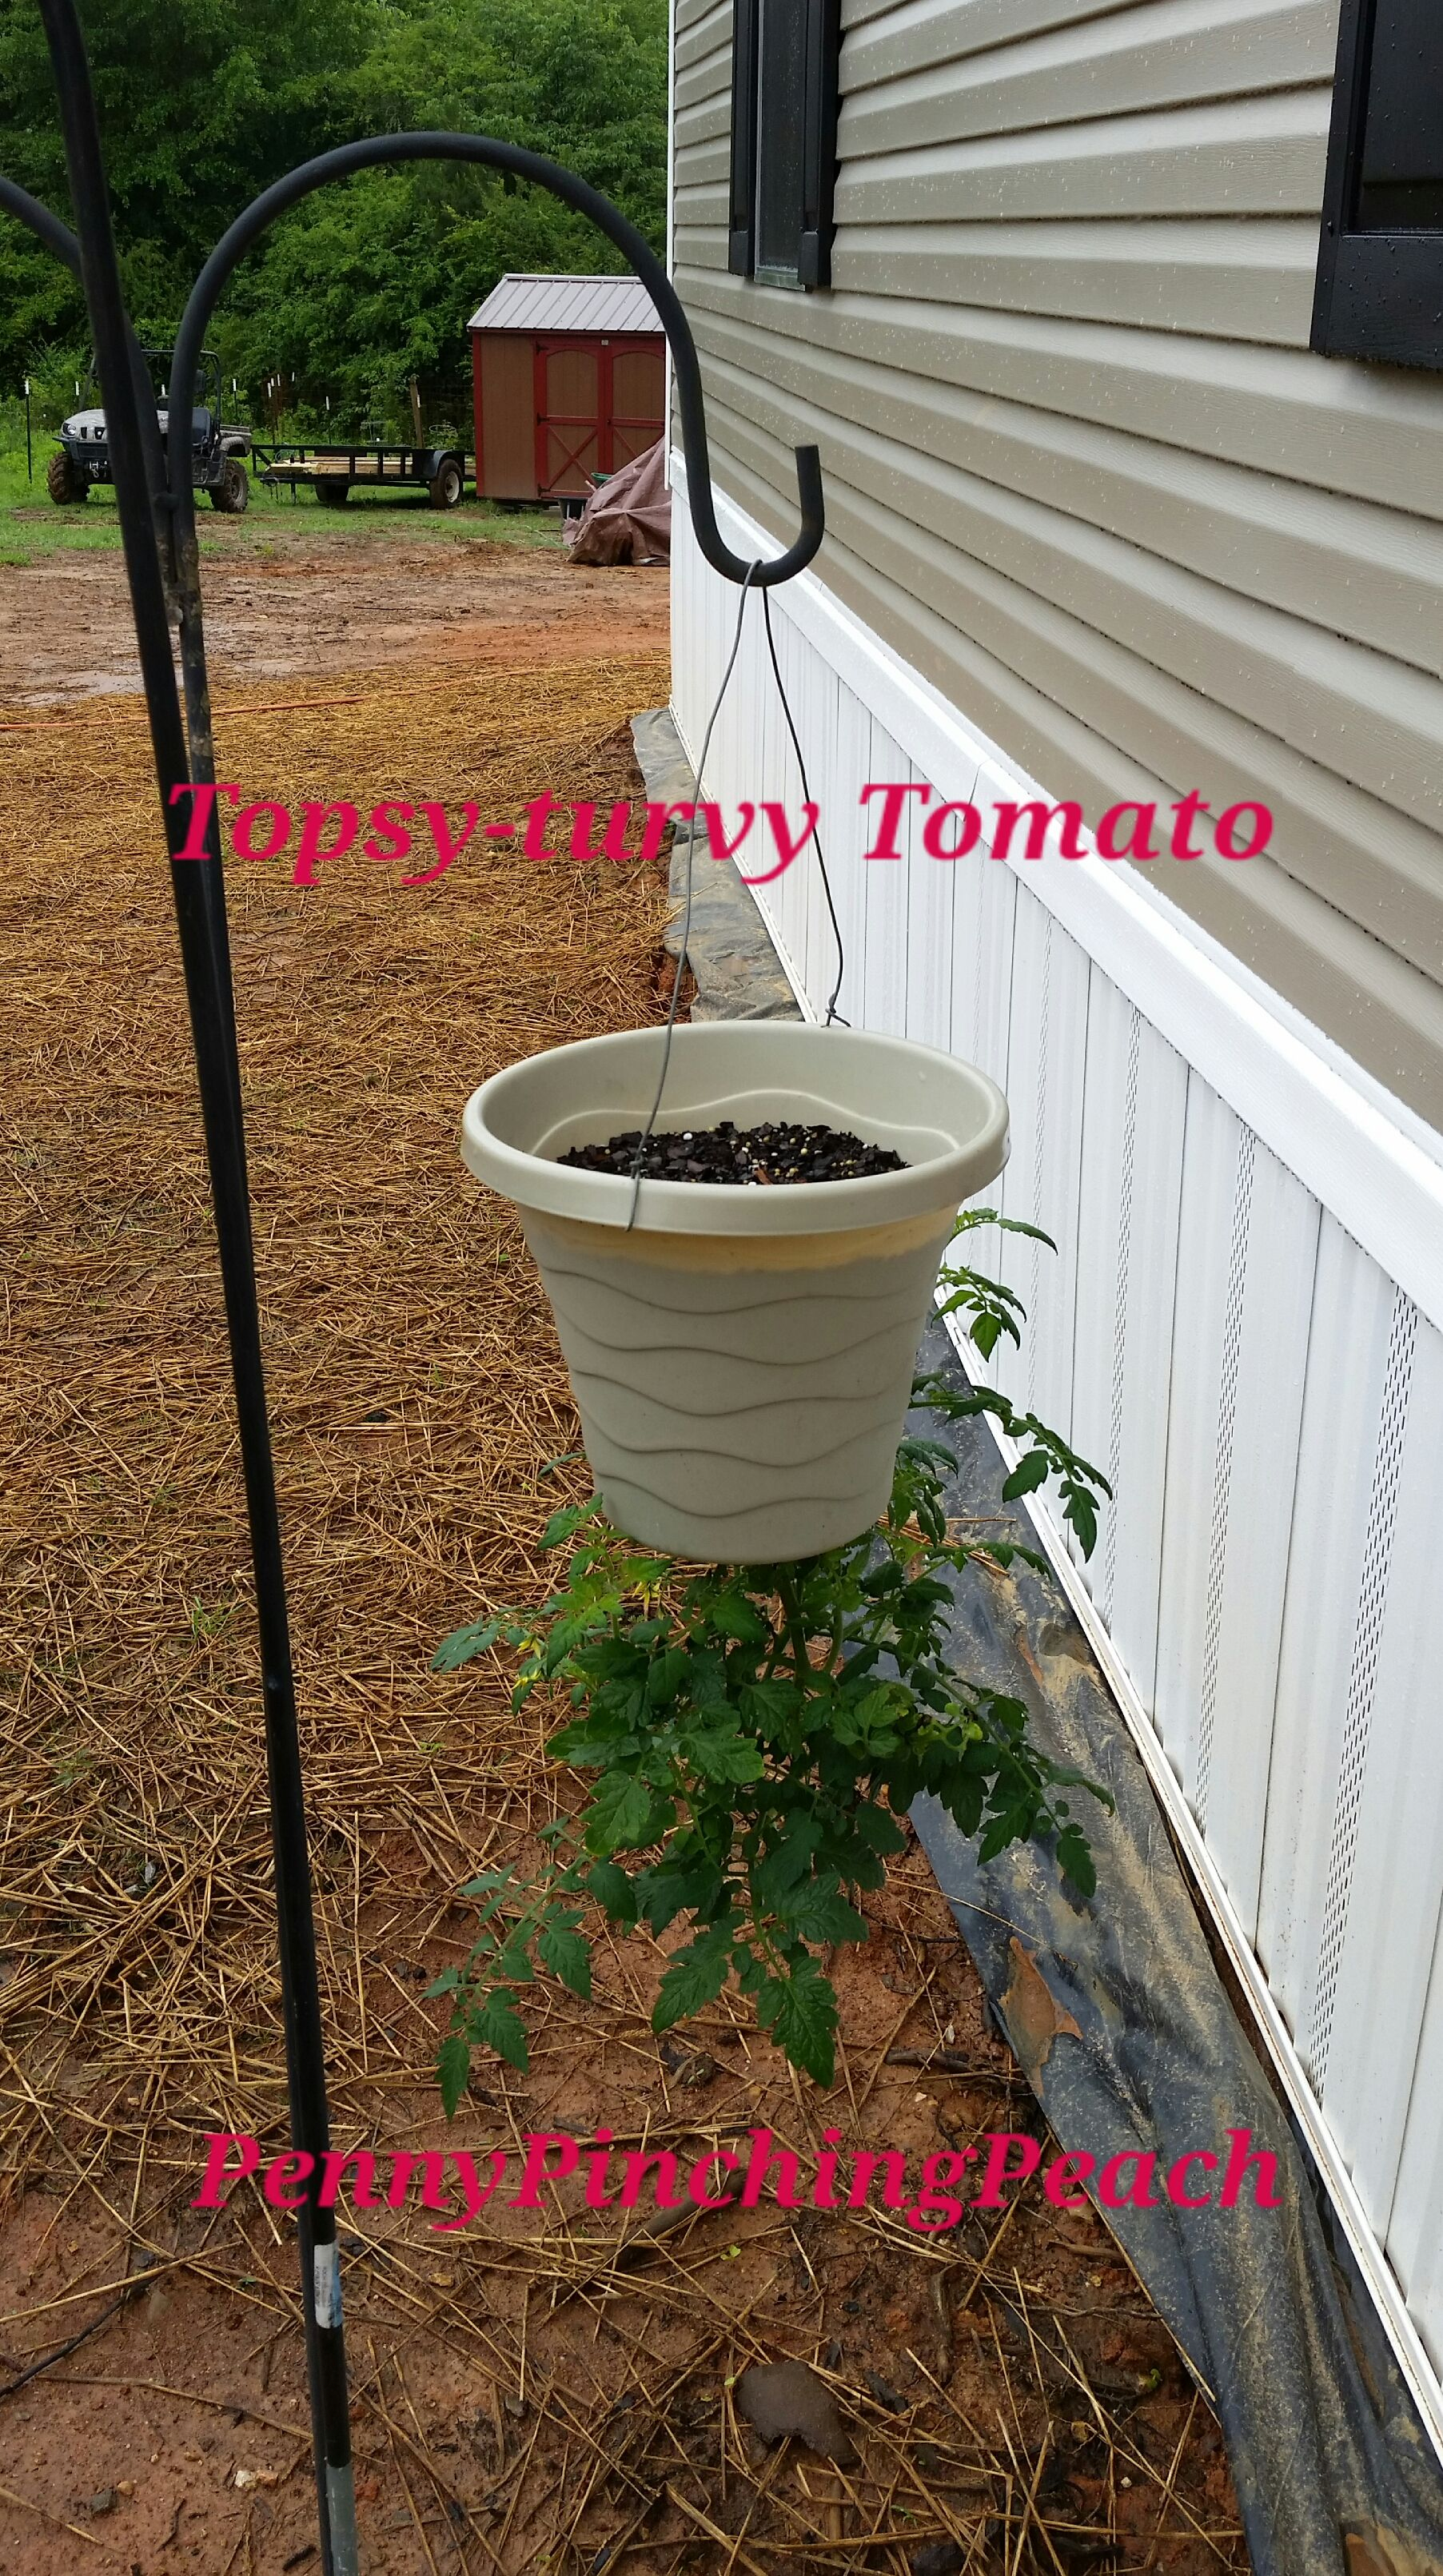 Diy Topsy Turvy Tomato Hanging Tomato Plants Tomato 400 x 300